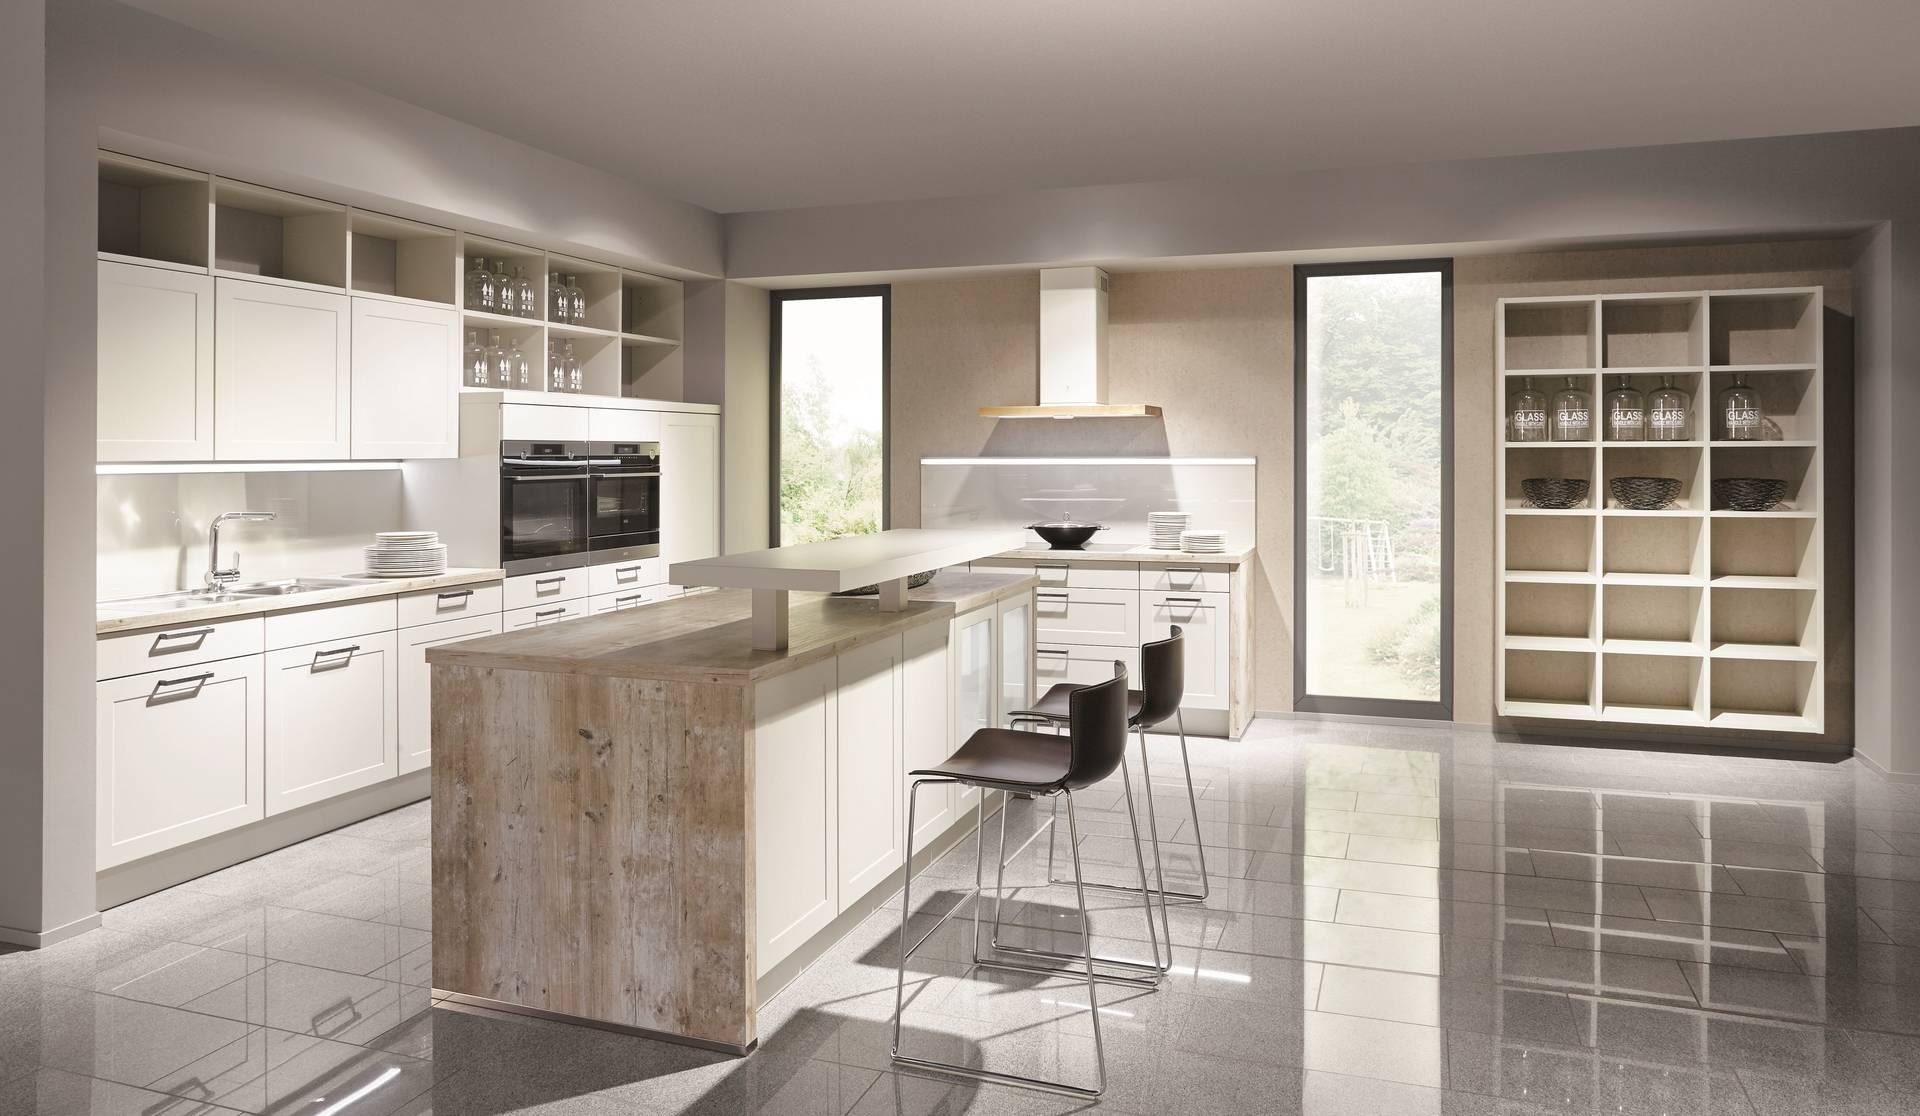 Stunning Nobilia Küchen Qualität Contemporary - Ridgewayng.com ...